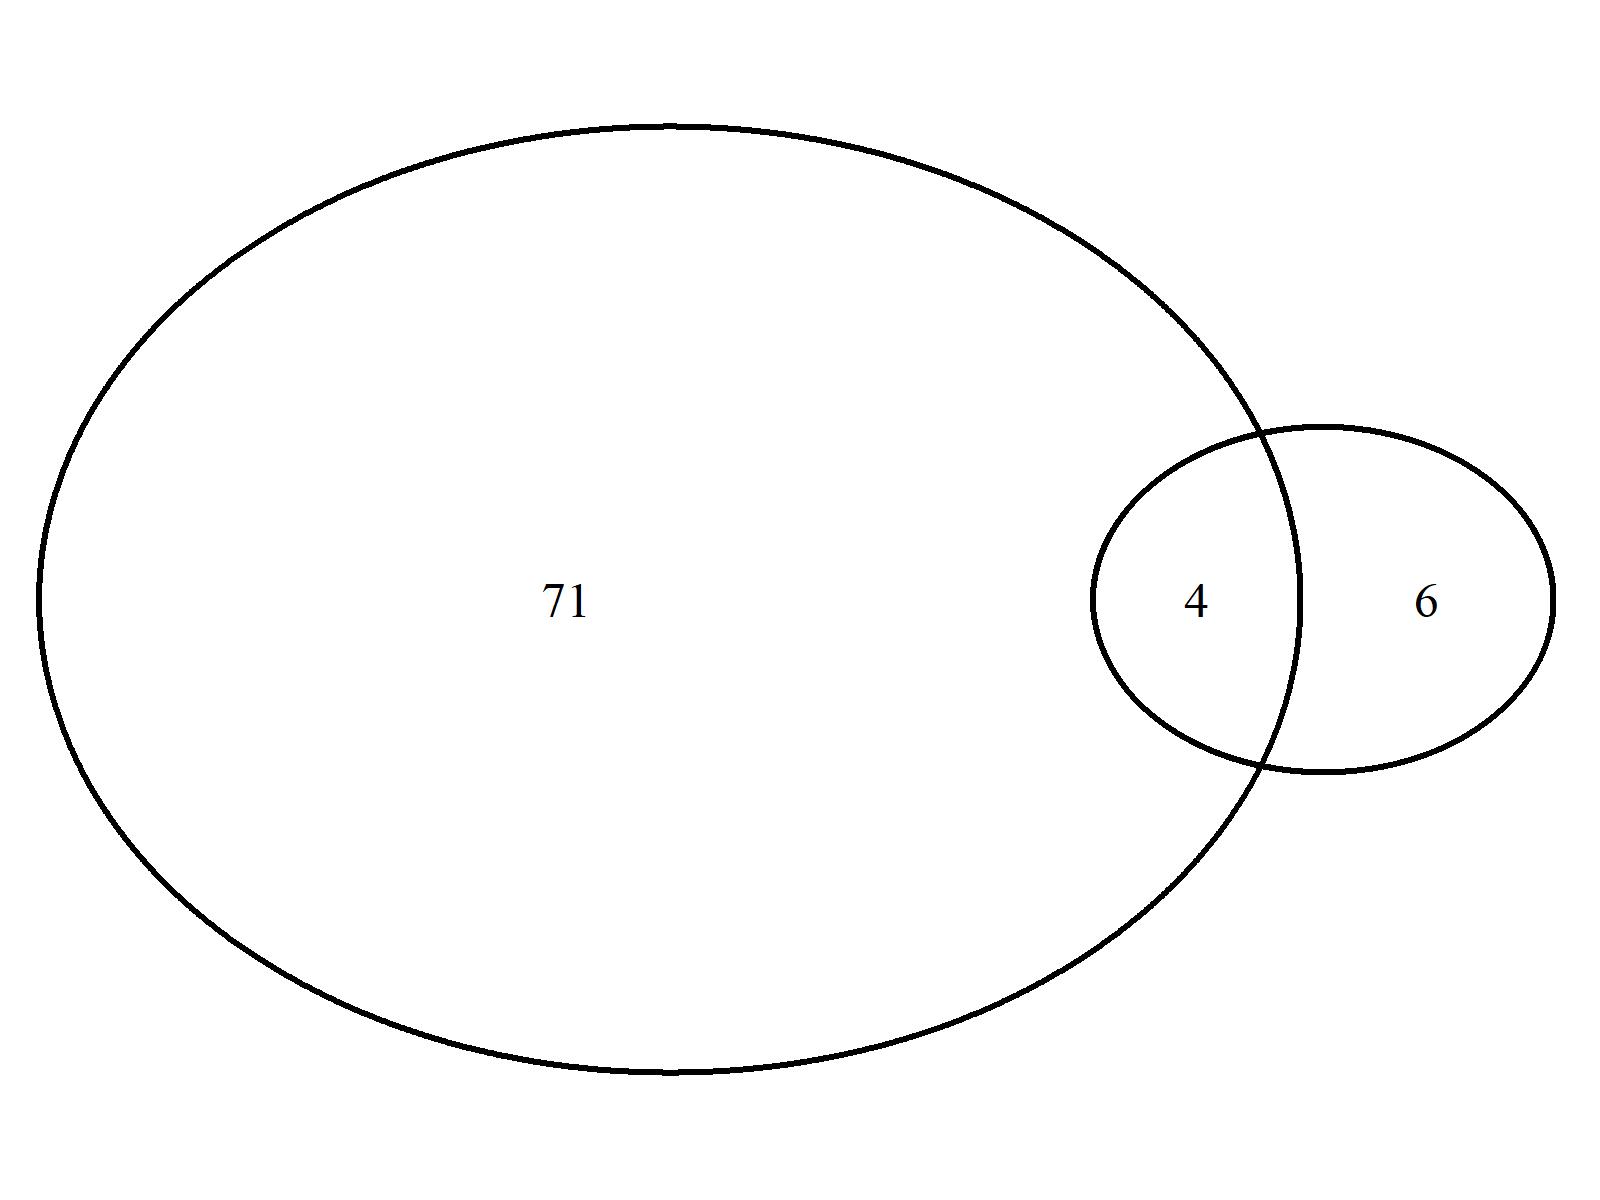 r graph figure 1 venn diagram proportional size r